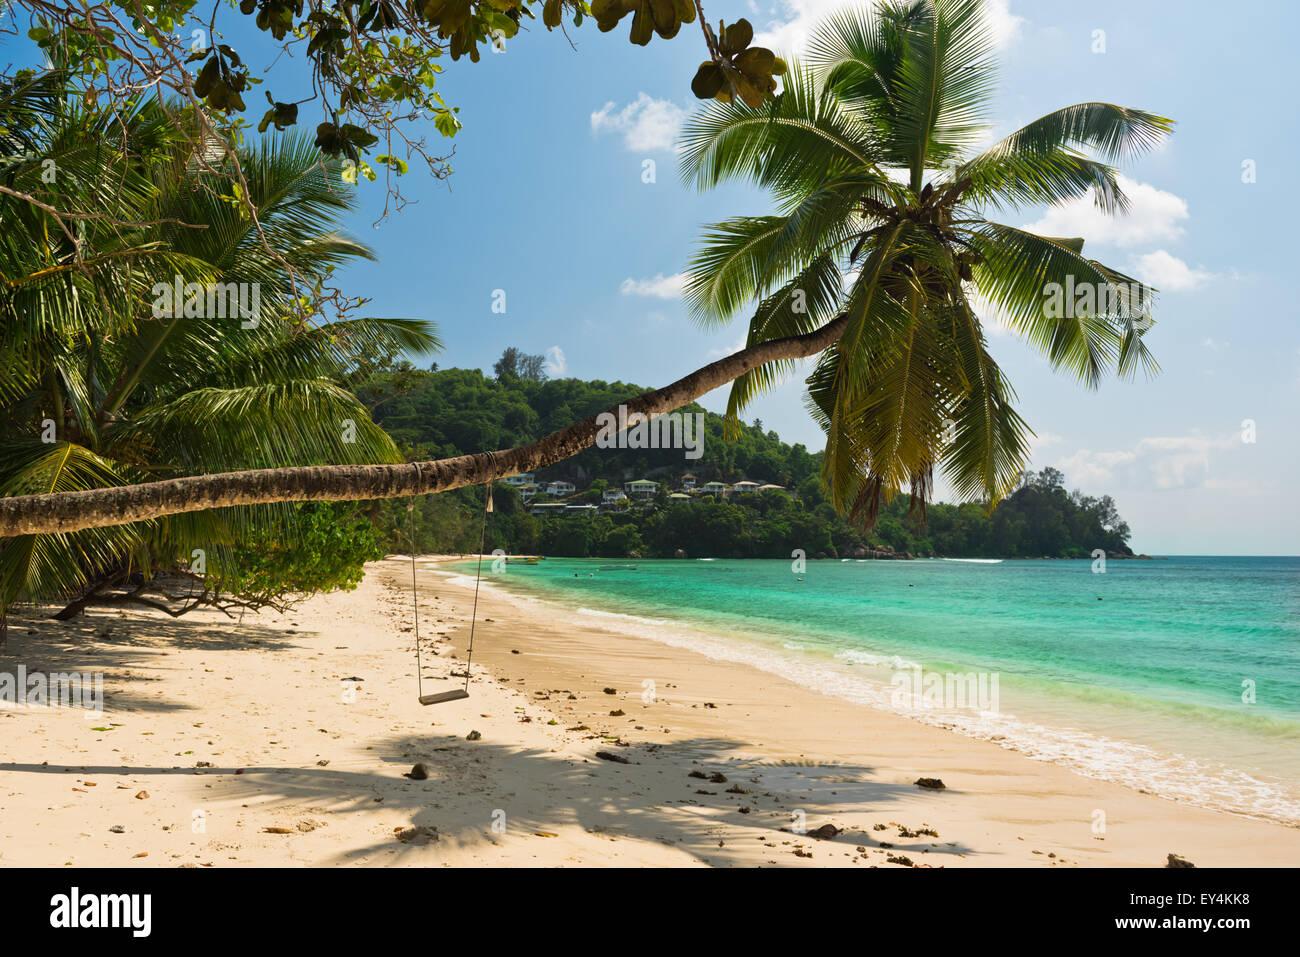 Tropical beach at Mahe island Seychelles. Horizontal shot - Stock Image